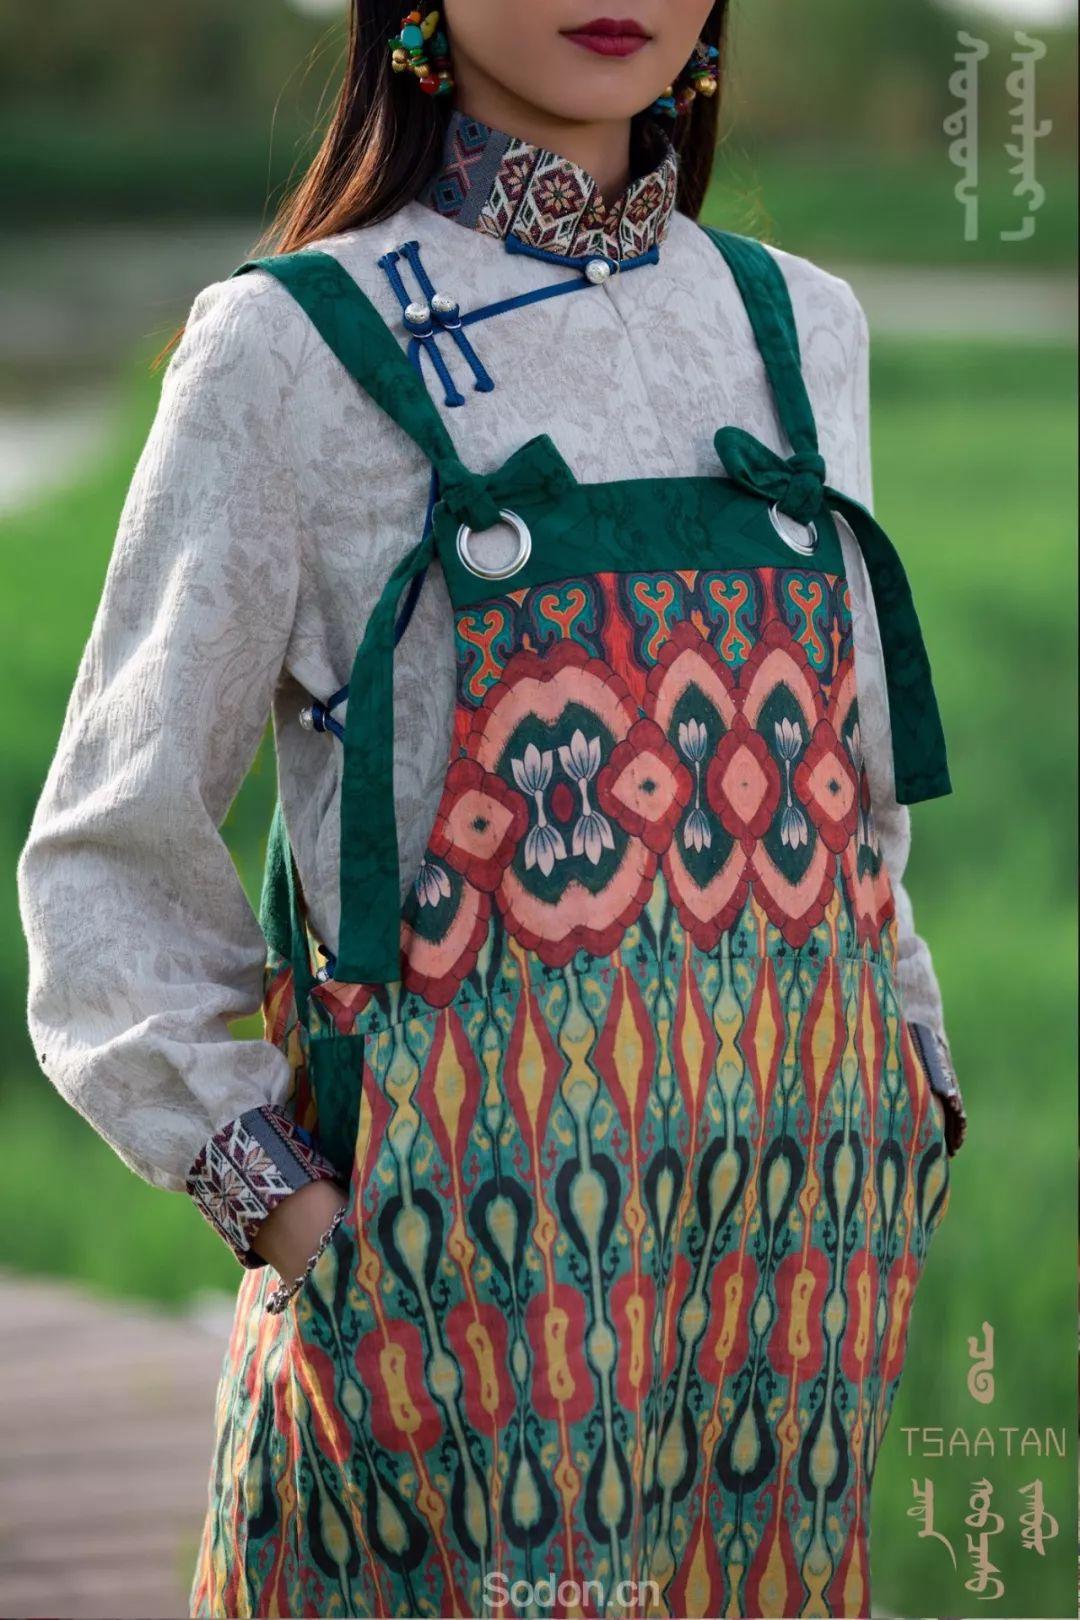 TSAATAN蒙古时装 2019夏季新款首发 第77张